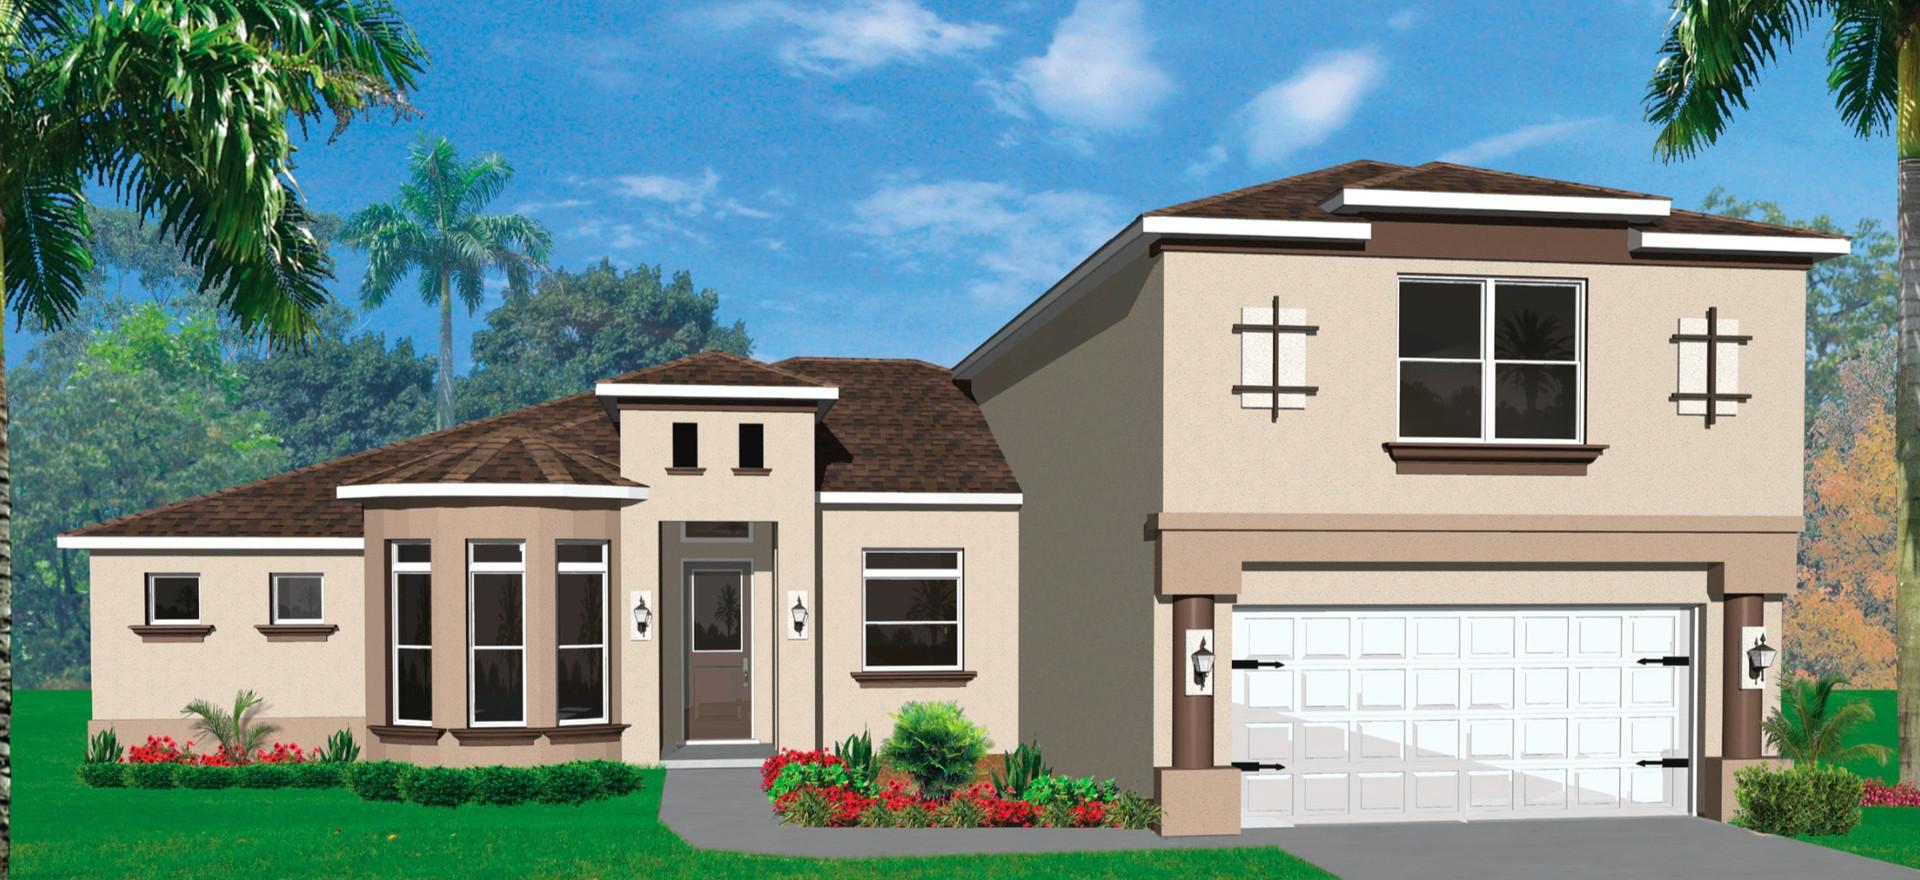 Casa Bella Floor Plan - Groza Builders Inc.